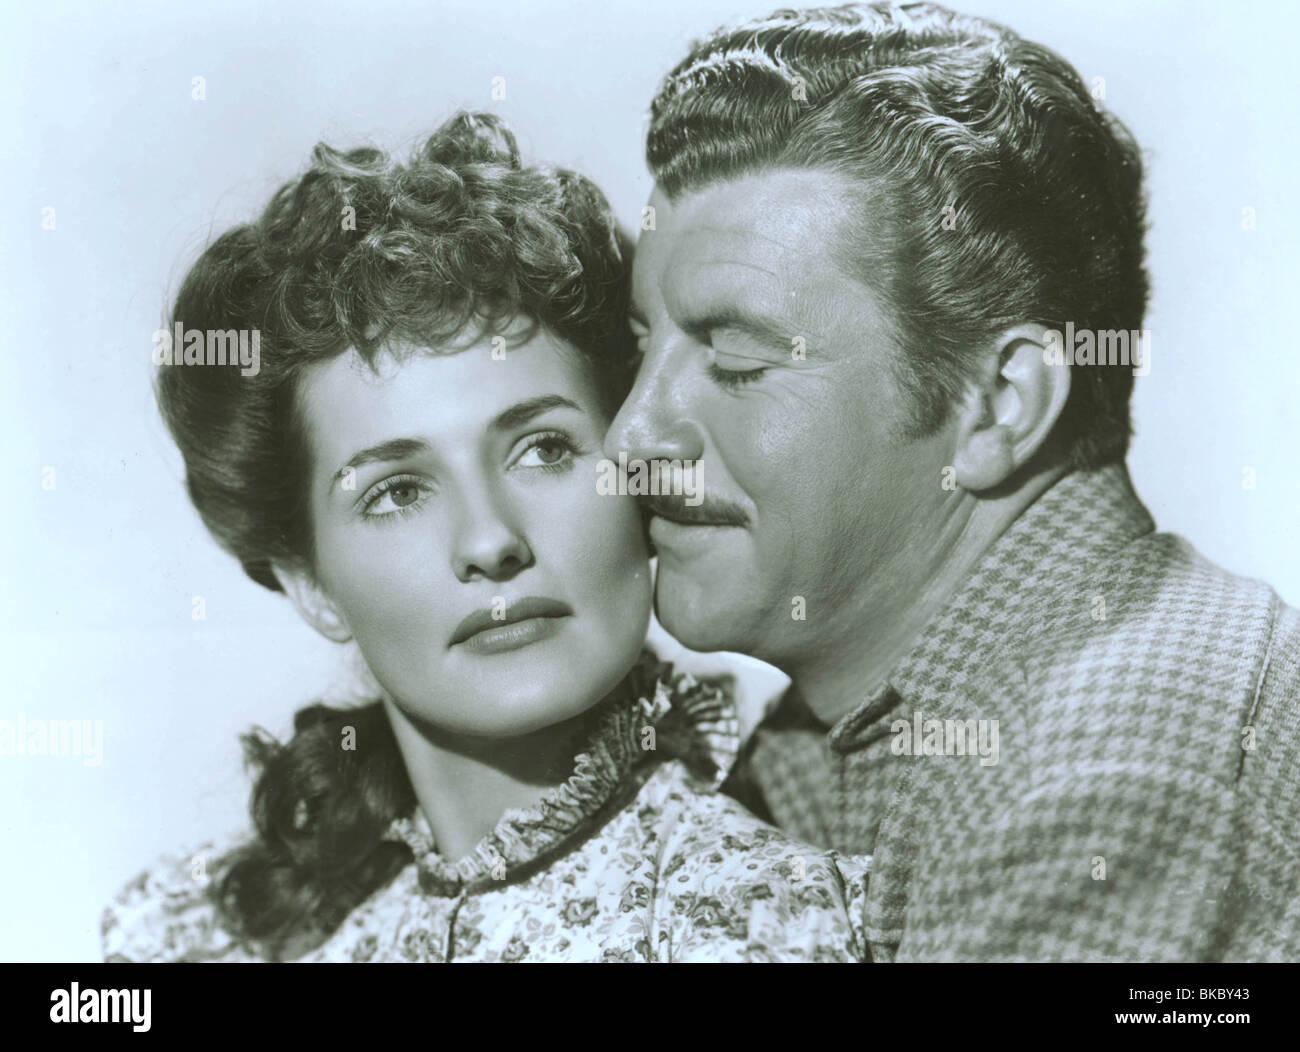 WHISPERING SMITH (1948) BRENDA MARSHALL, ROBERT PRESTON WHSM 003P - Stock Image